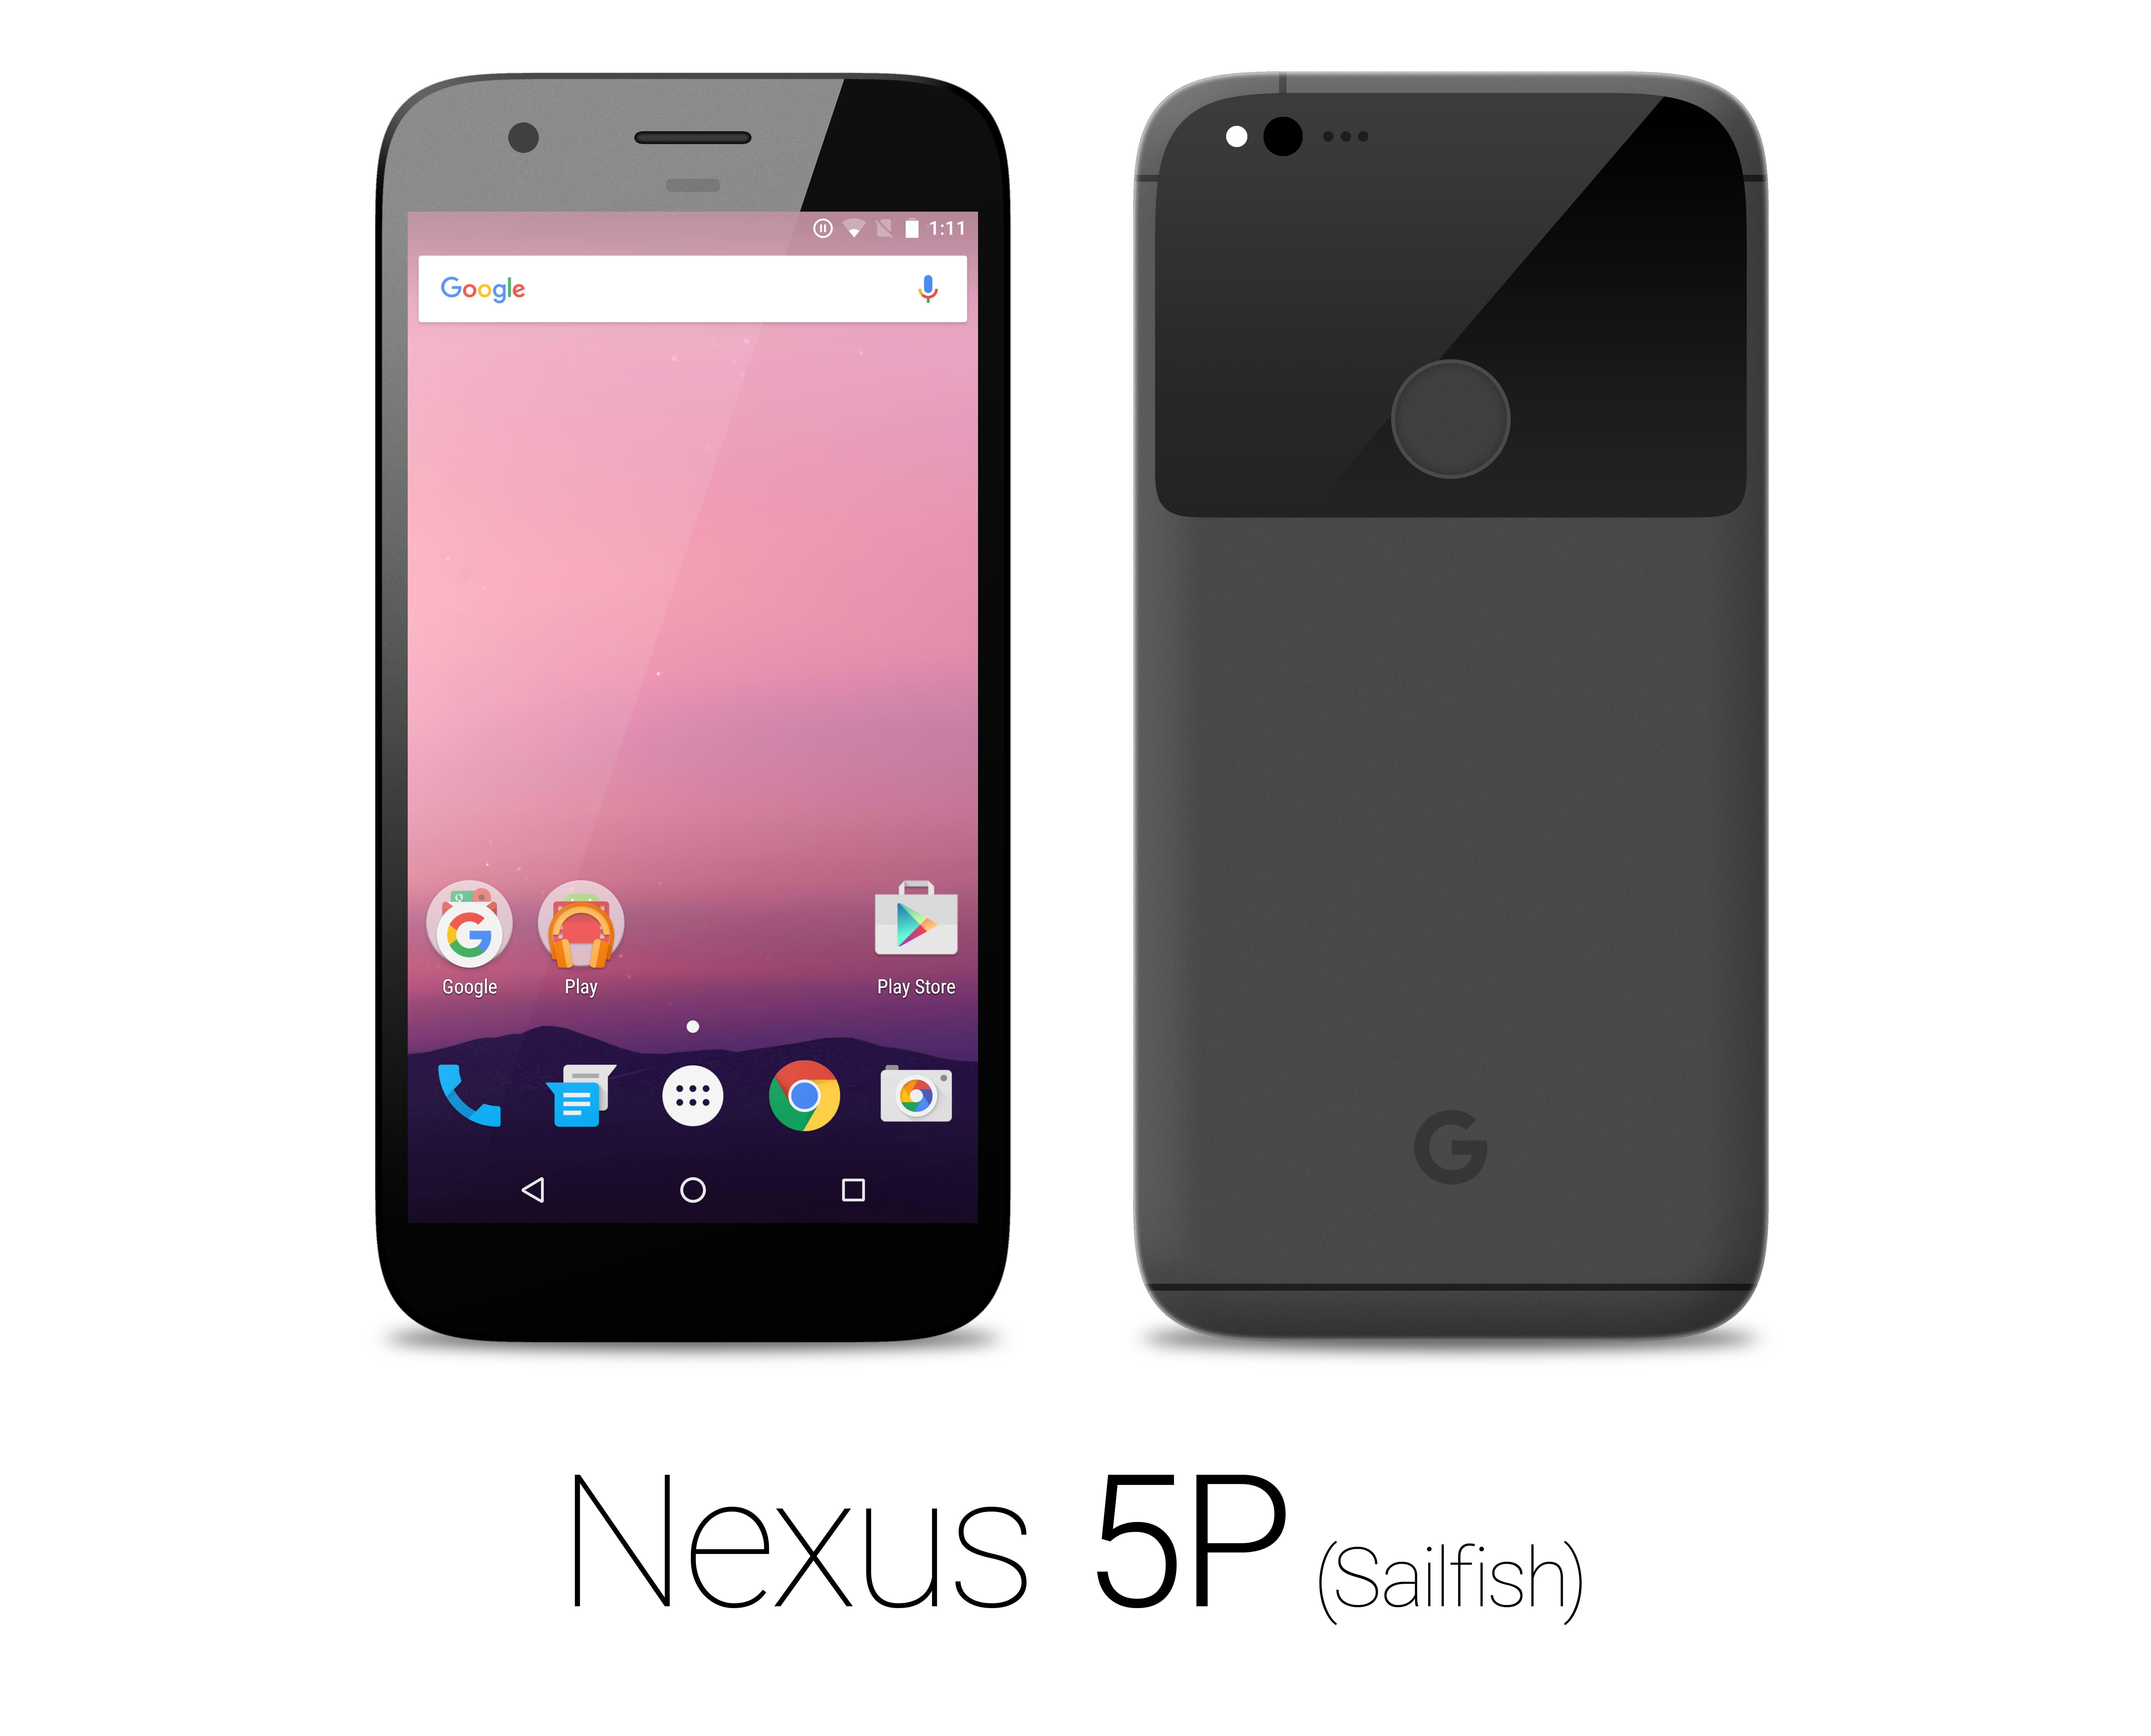 HTC Nexus 5P 4